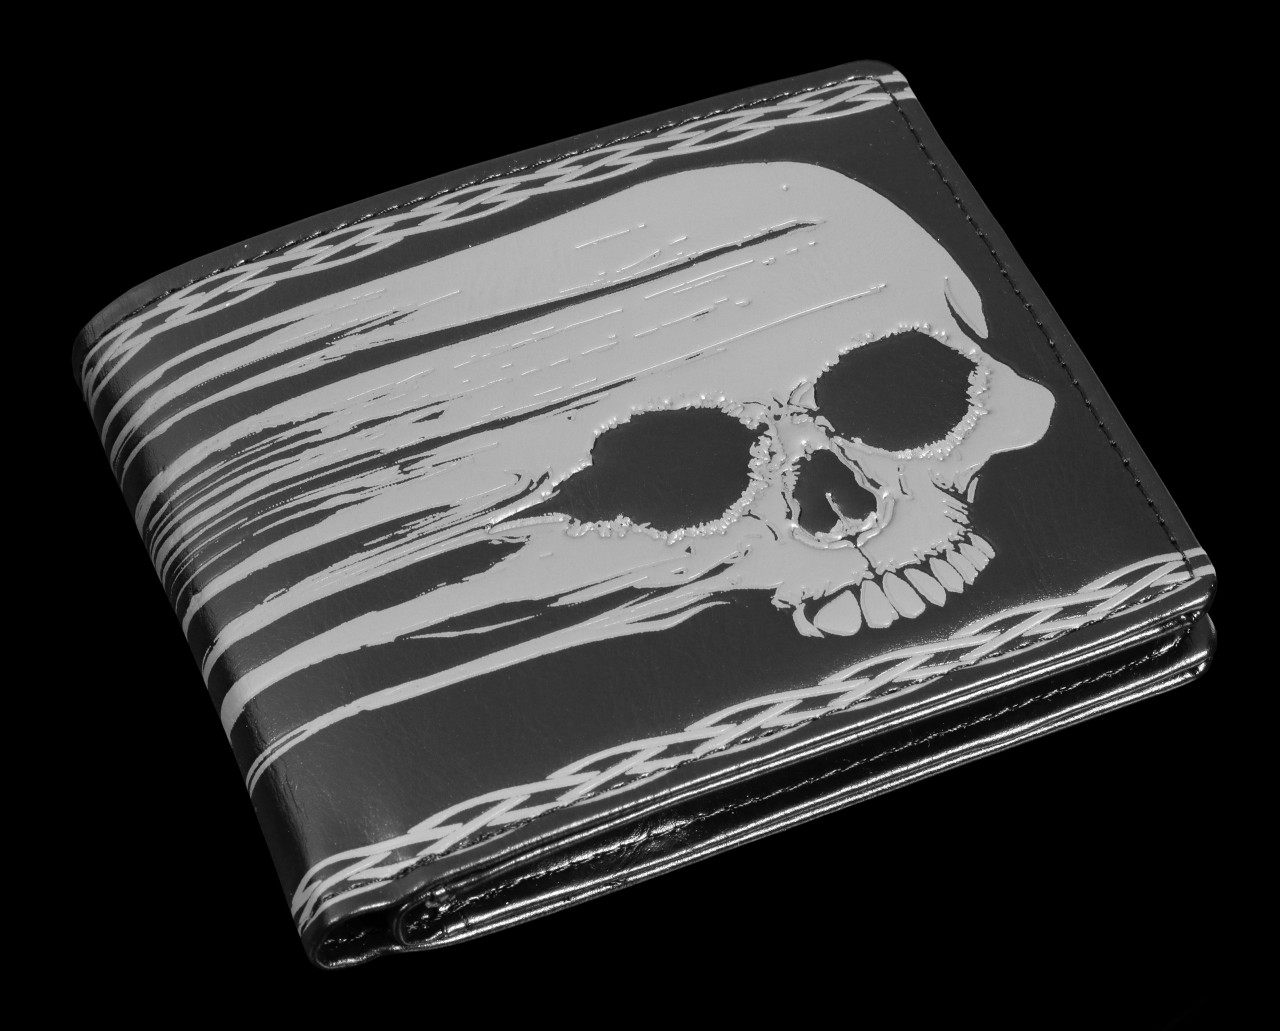 Men's Wallet with Skull - Blurred